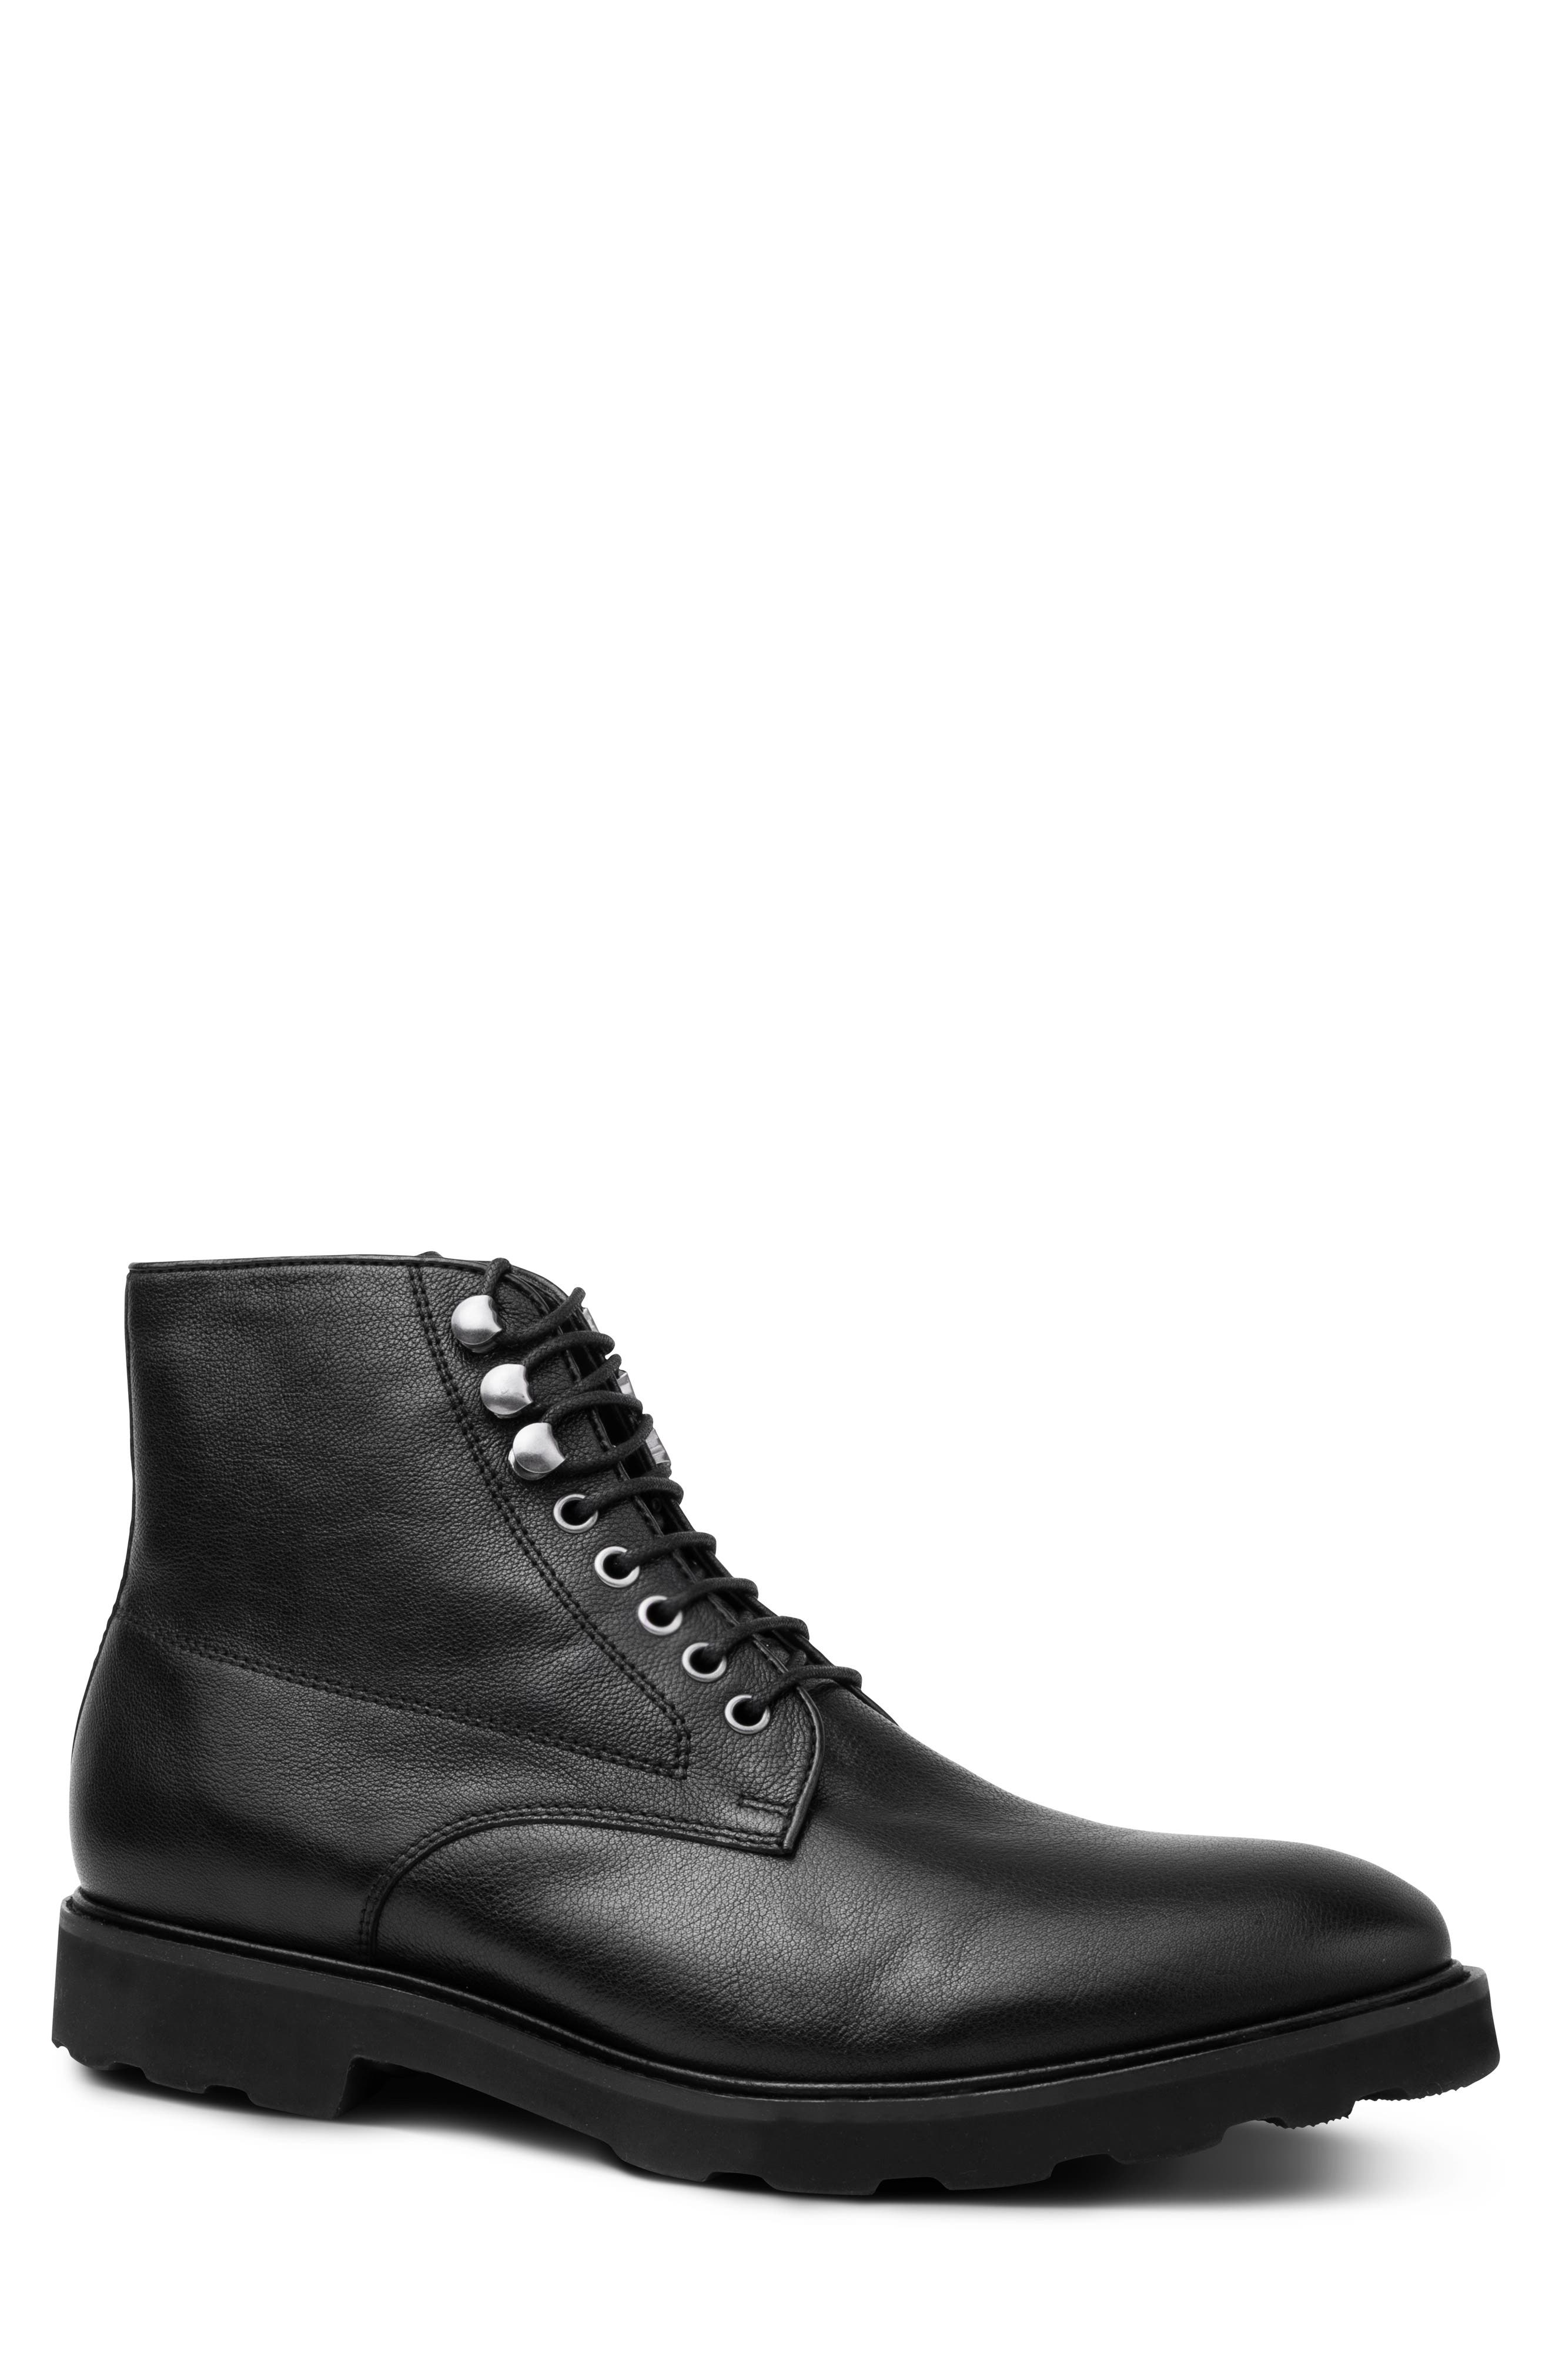 Williams Boot